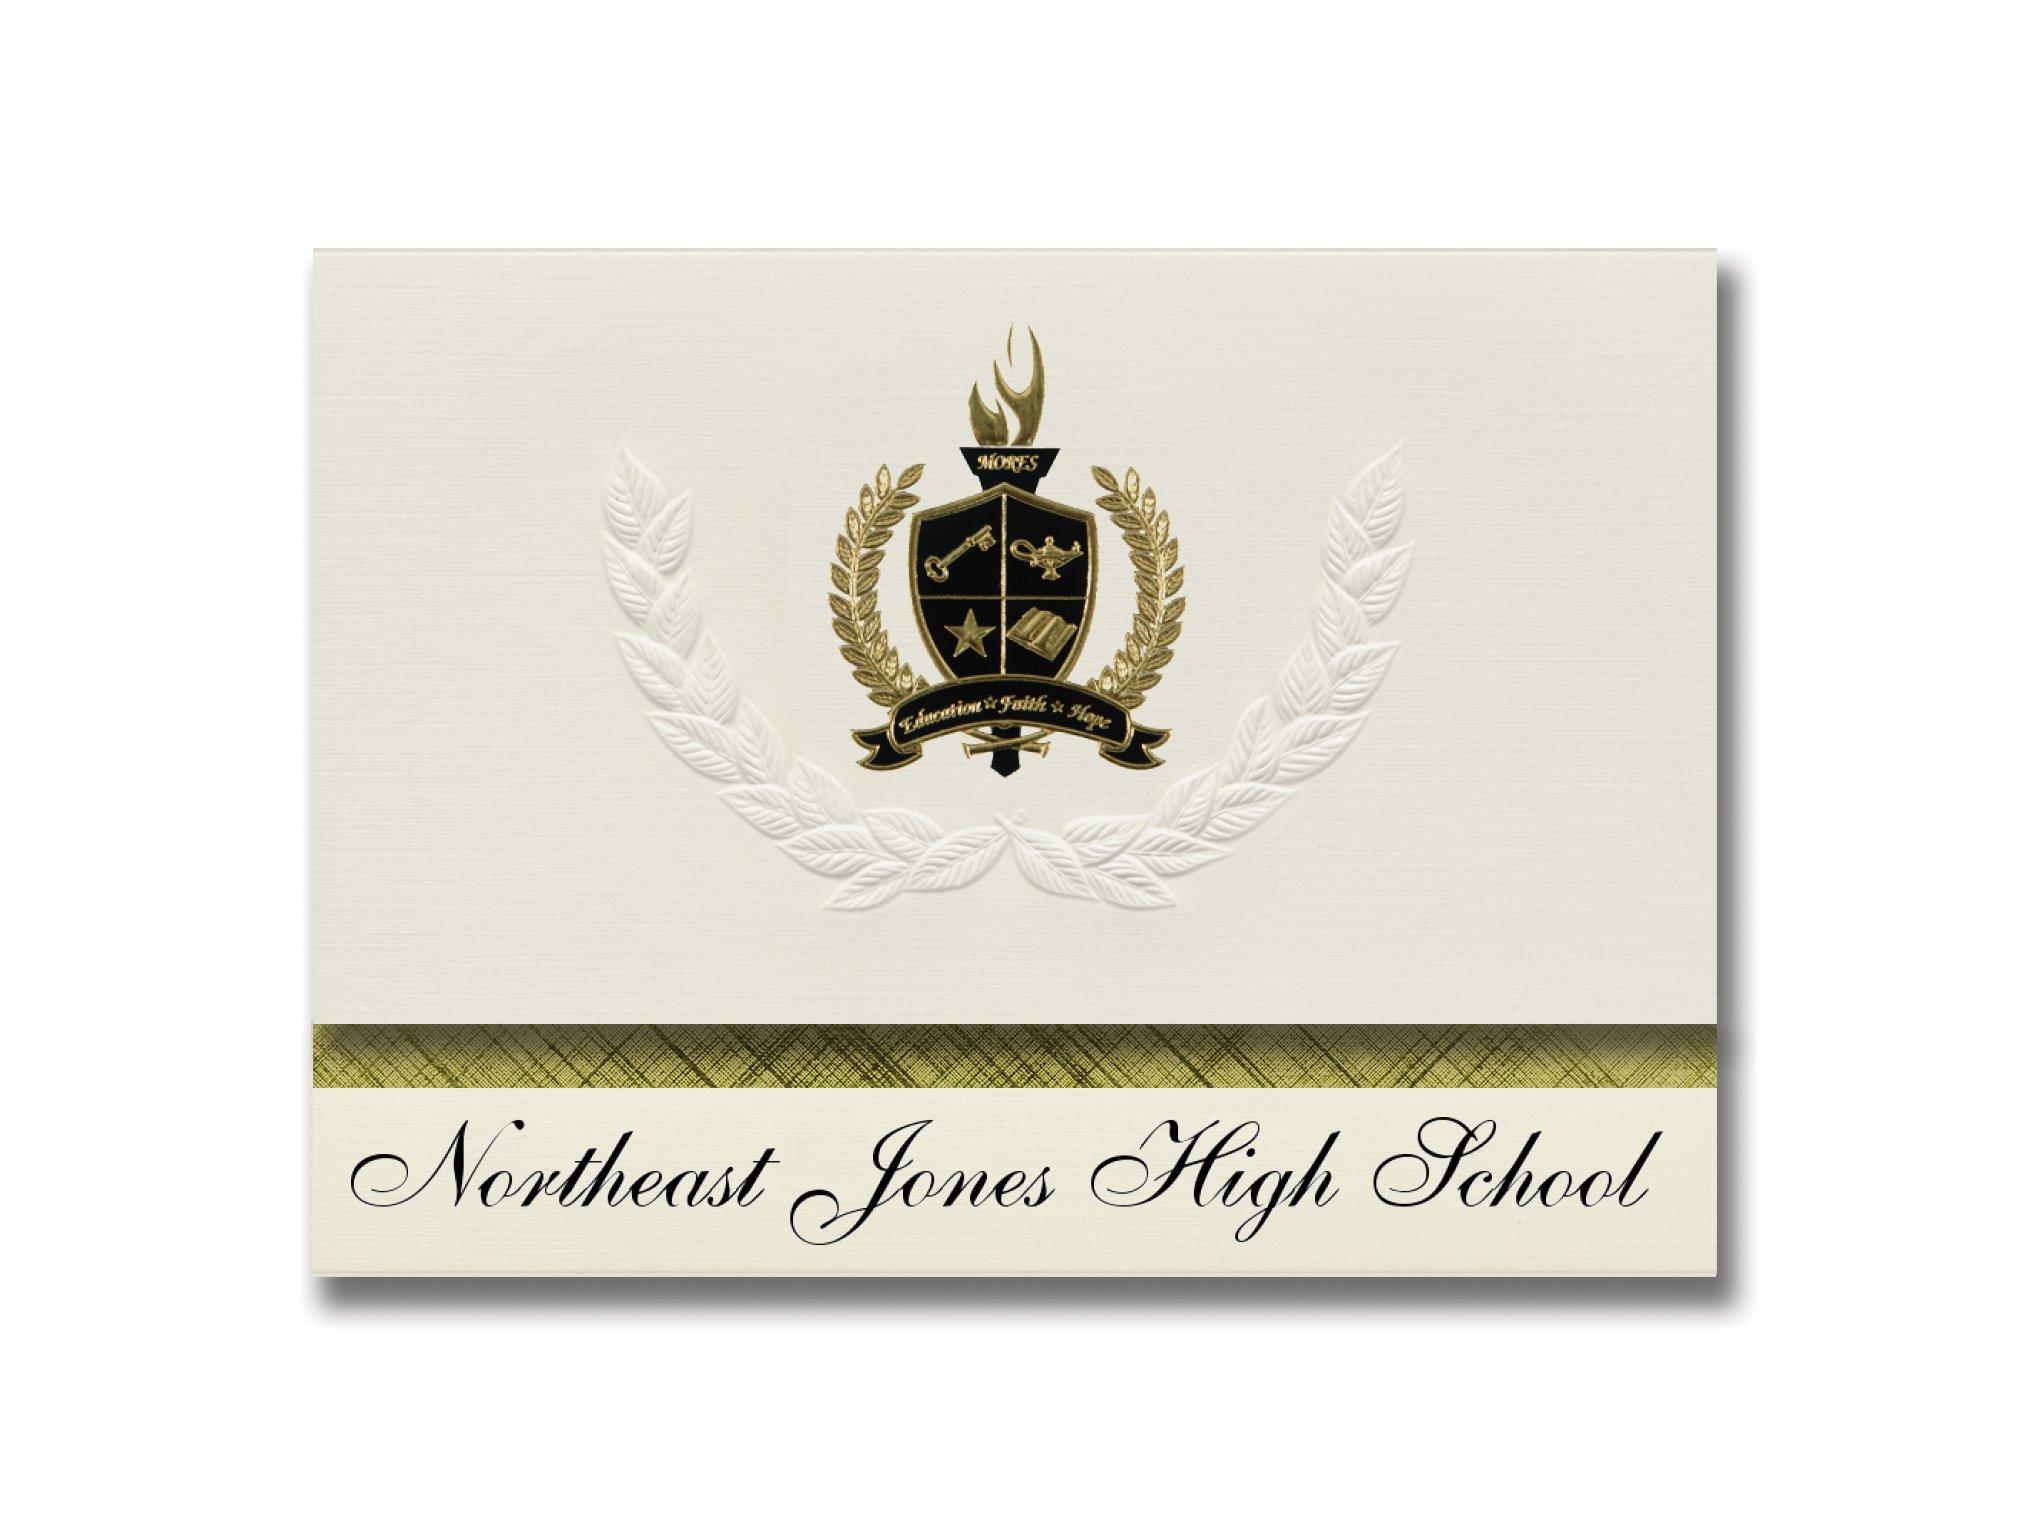 Signature Announcements Northeast Jones High School (Laurel, MS) Graduation Announcements, Presidential style, Elite package of 25 with Gold & Black Metallic Foil seal